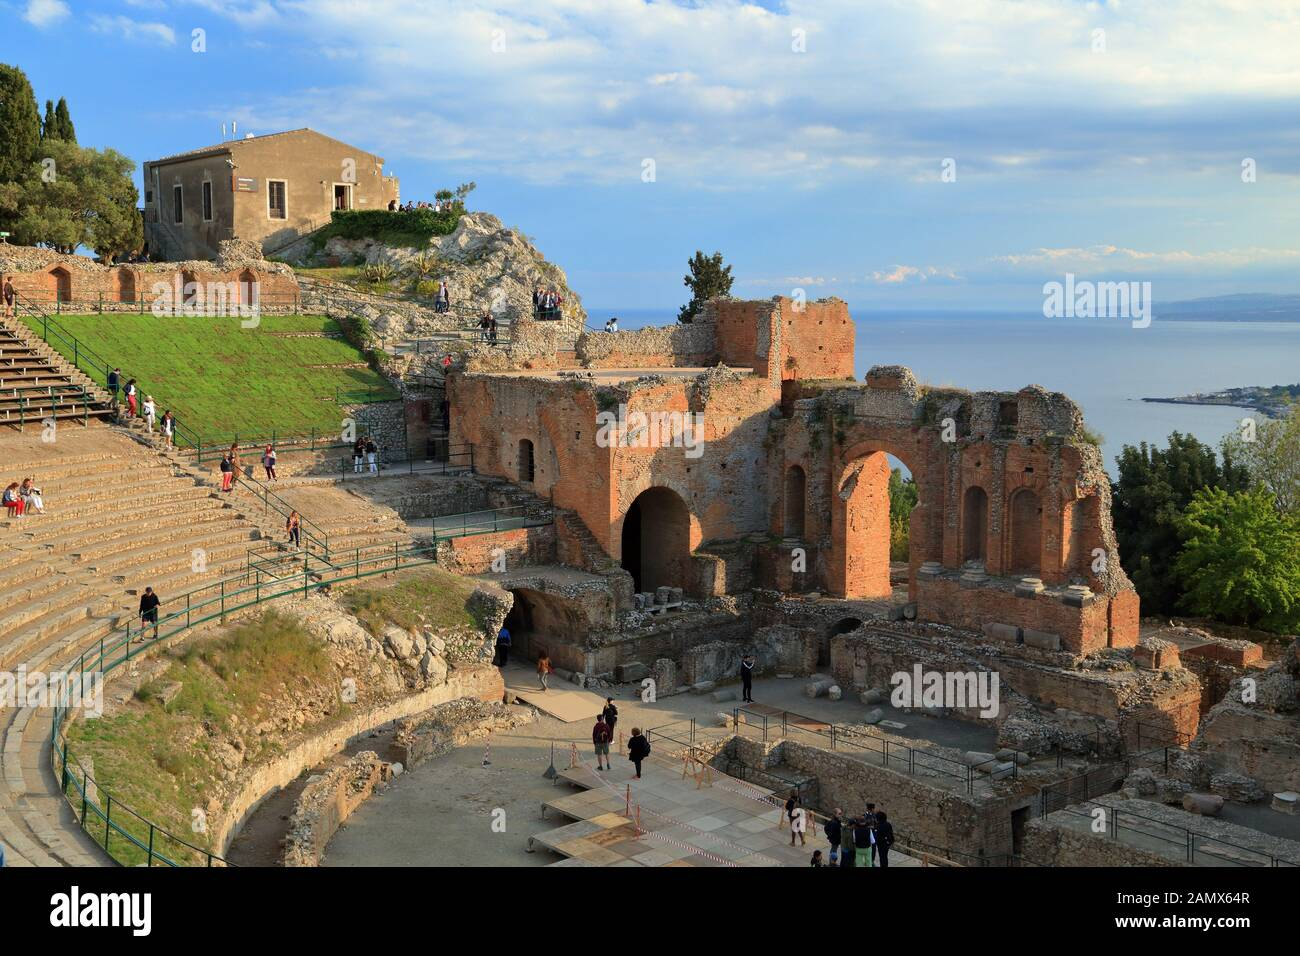 Altgriechisches Theater (Theater Greco) von Taormina. Das Theater antico di Taormina Stockfoto